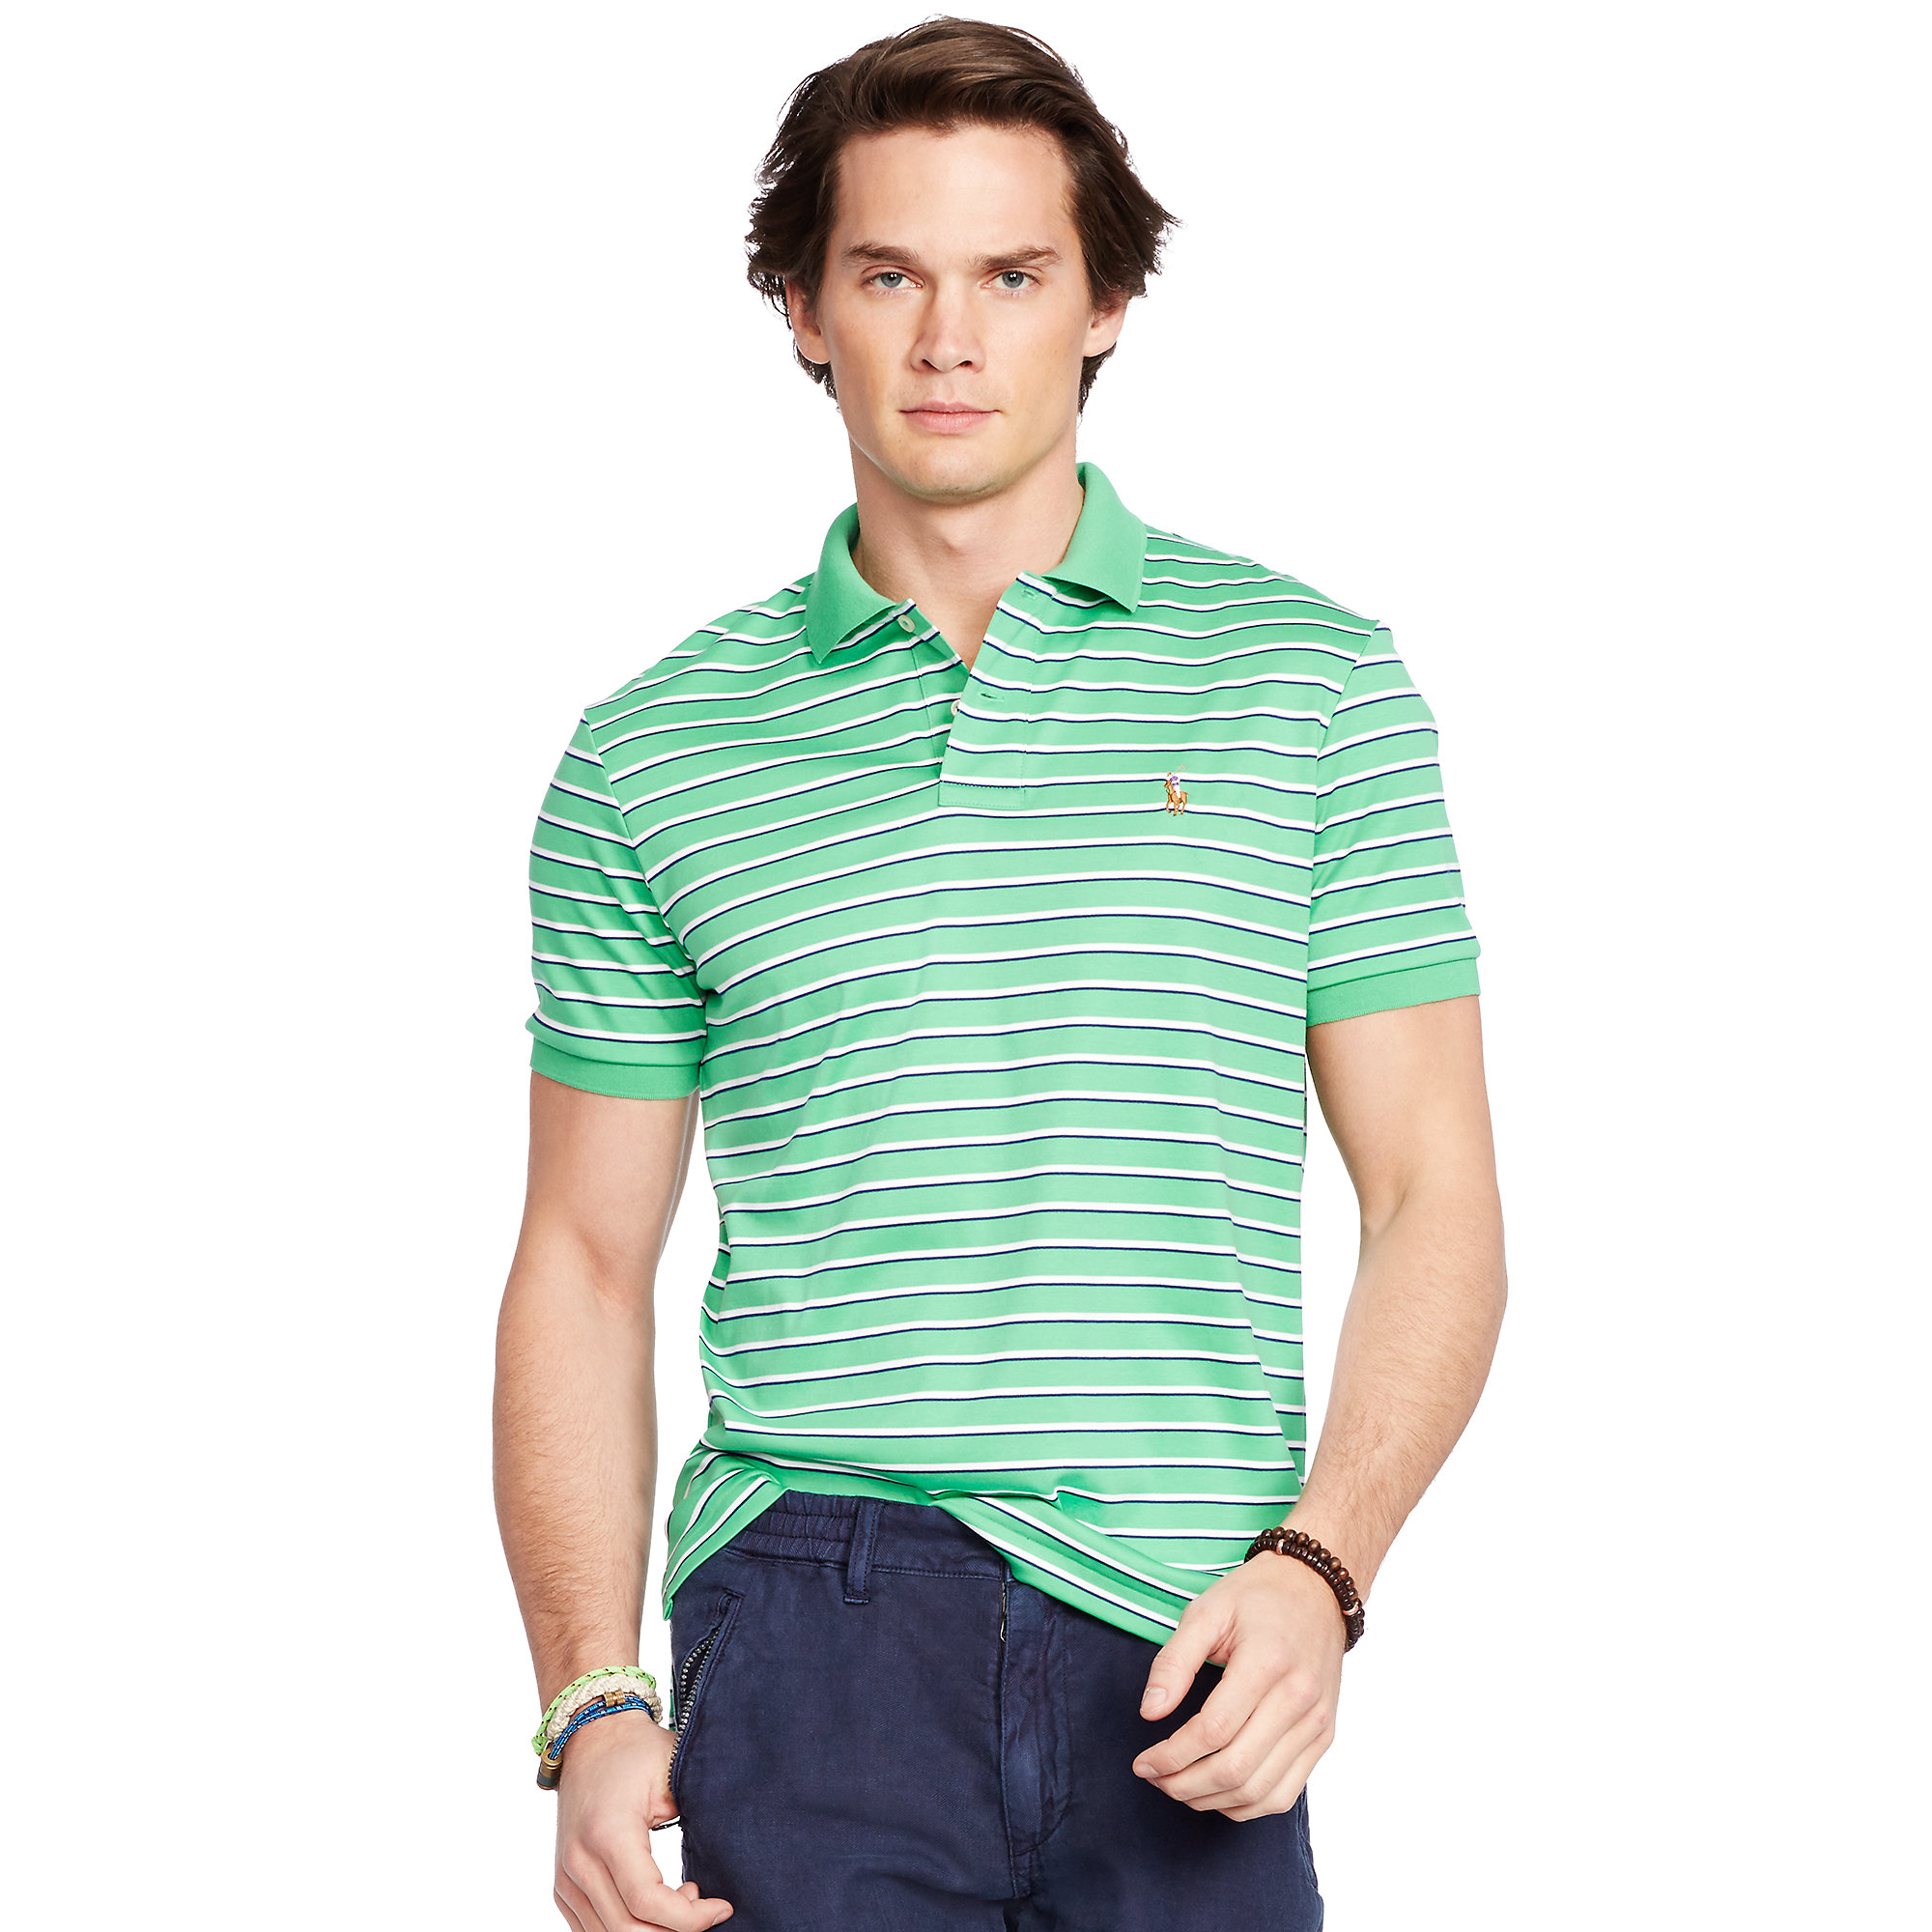 52e92cdb Lyst - Polo Ralph Lauren Striped Pima Soft-touch Polo in Green for Men